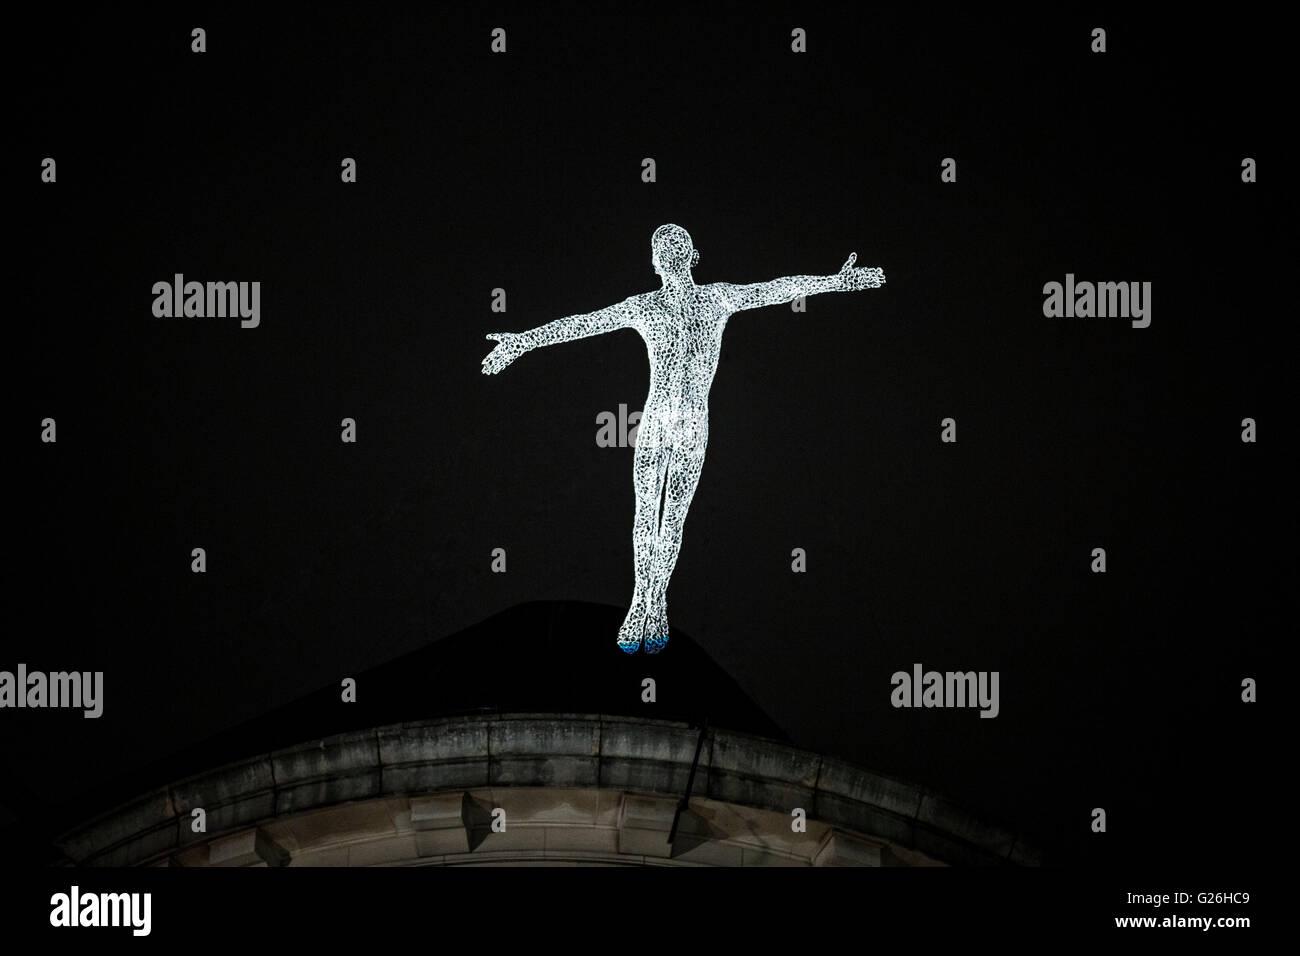 Lumiere london 2016 lighting art london lighting glow lumiere london 2016 lighting art london lighting glow lighting art wire arte hombre human light fly light color ar buycottarizona